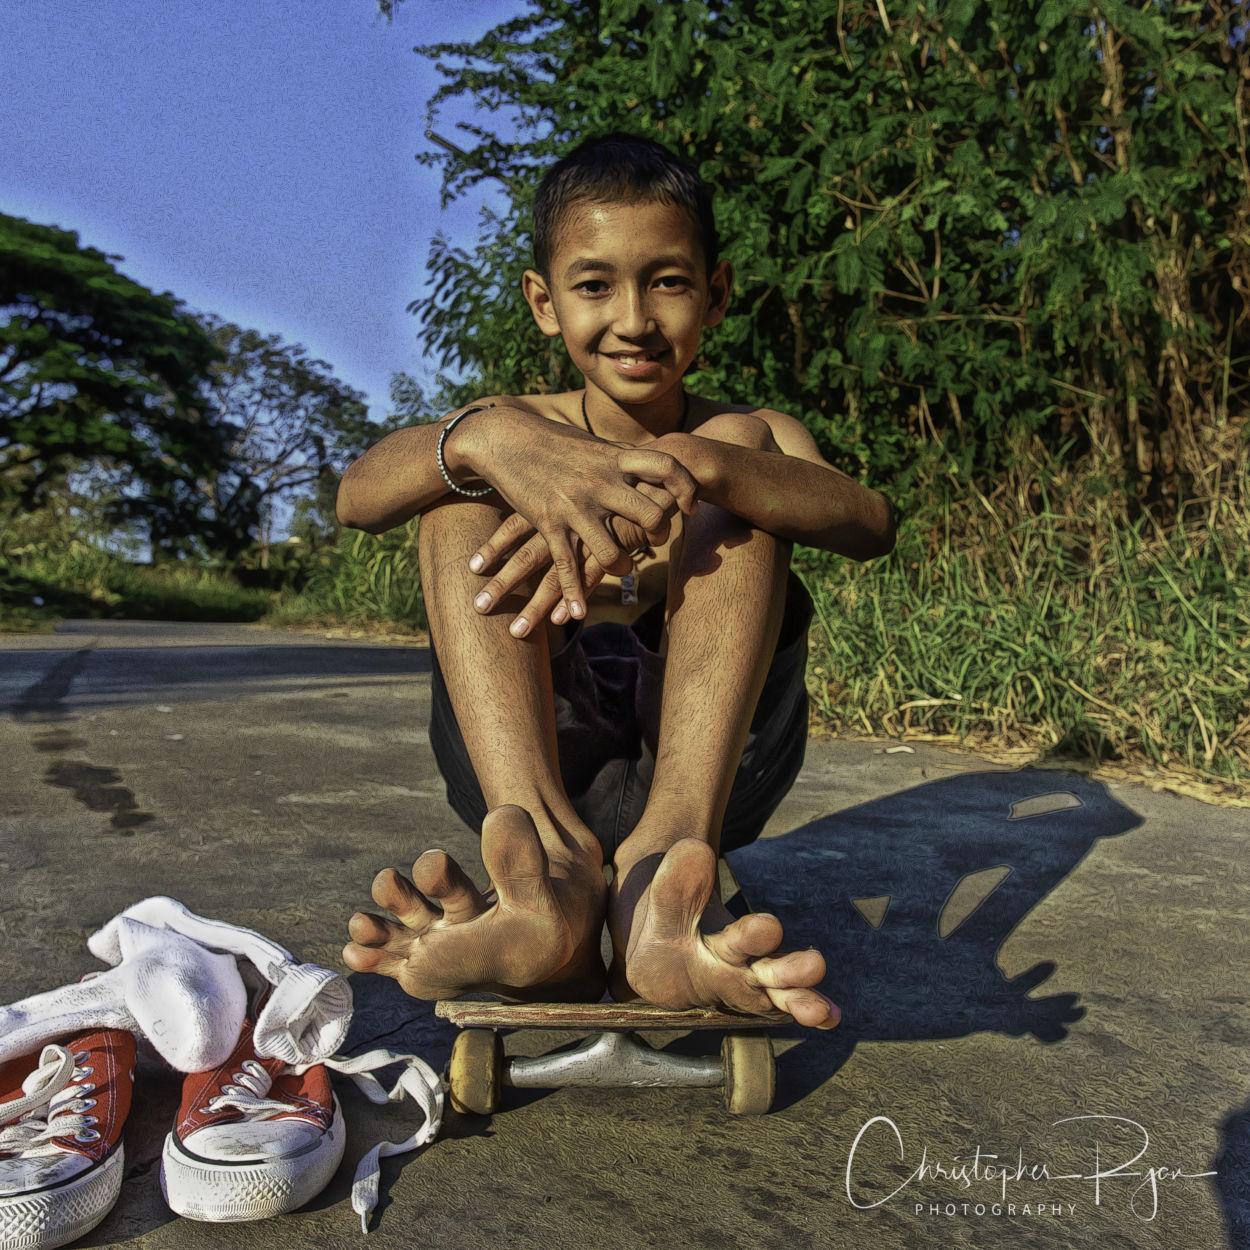 boy feet, barefoot skater, spread toes, kids feet, cute boy, shirtless boy, shirtless skater